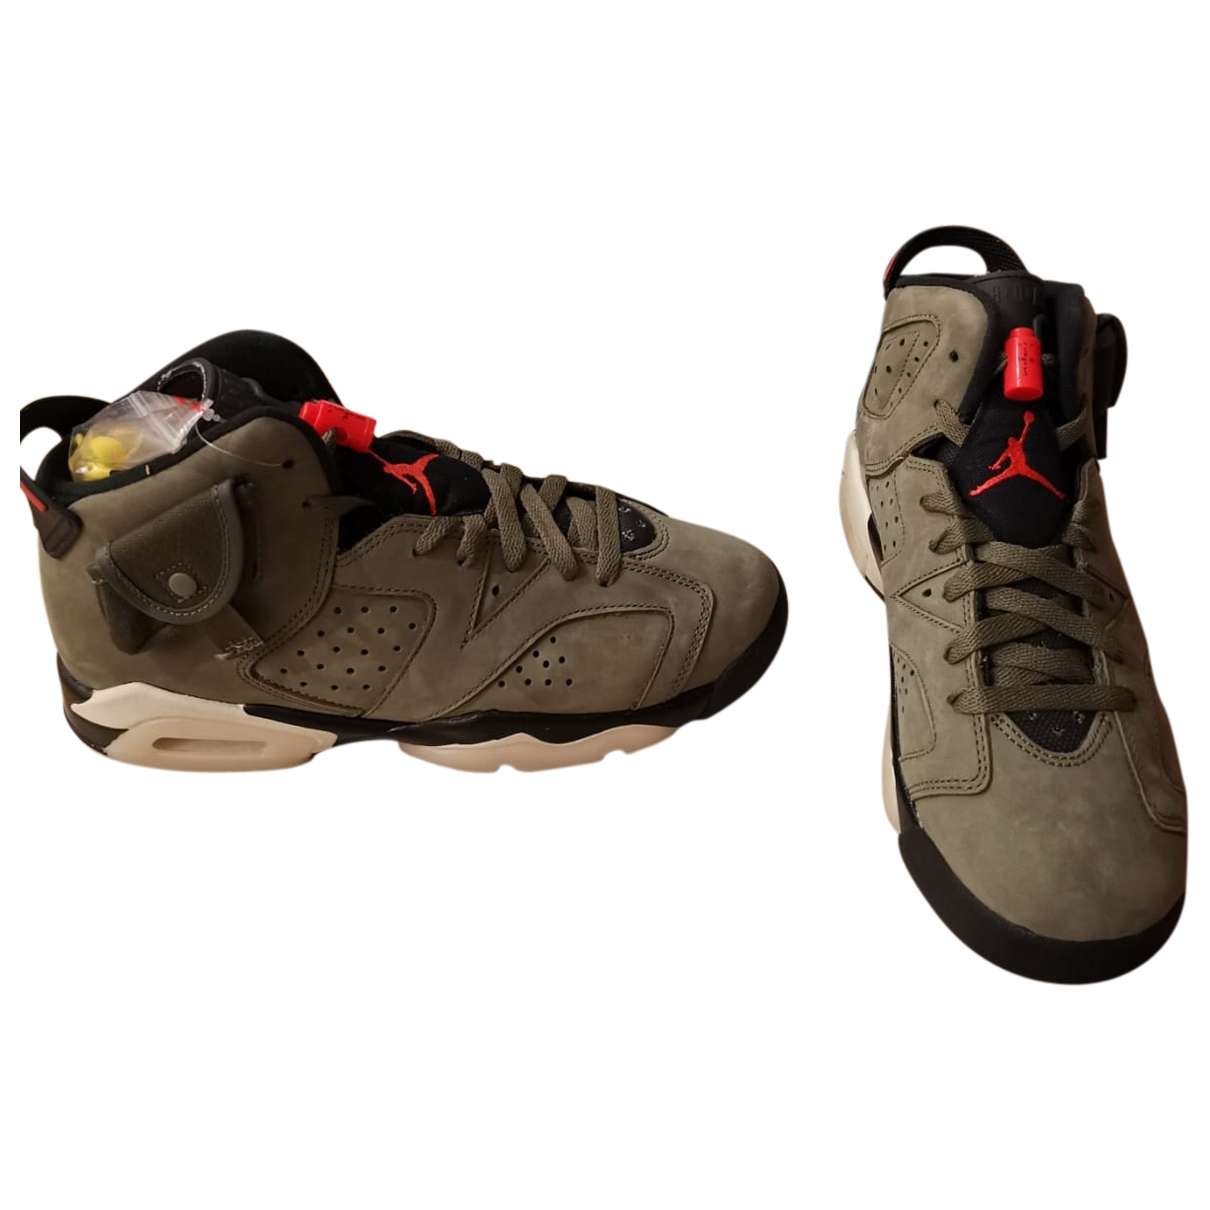 Nike X Travis Scott - Baskets Air Jordan 1 pour femme en suede - kaki